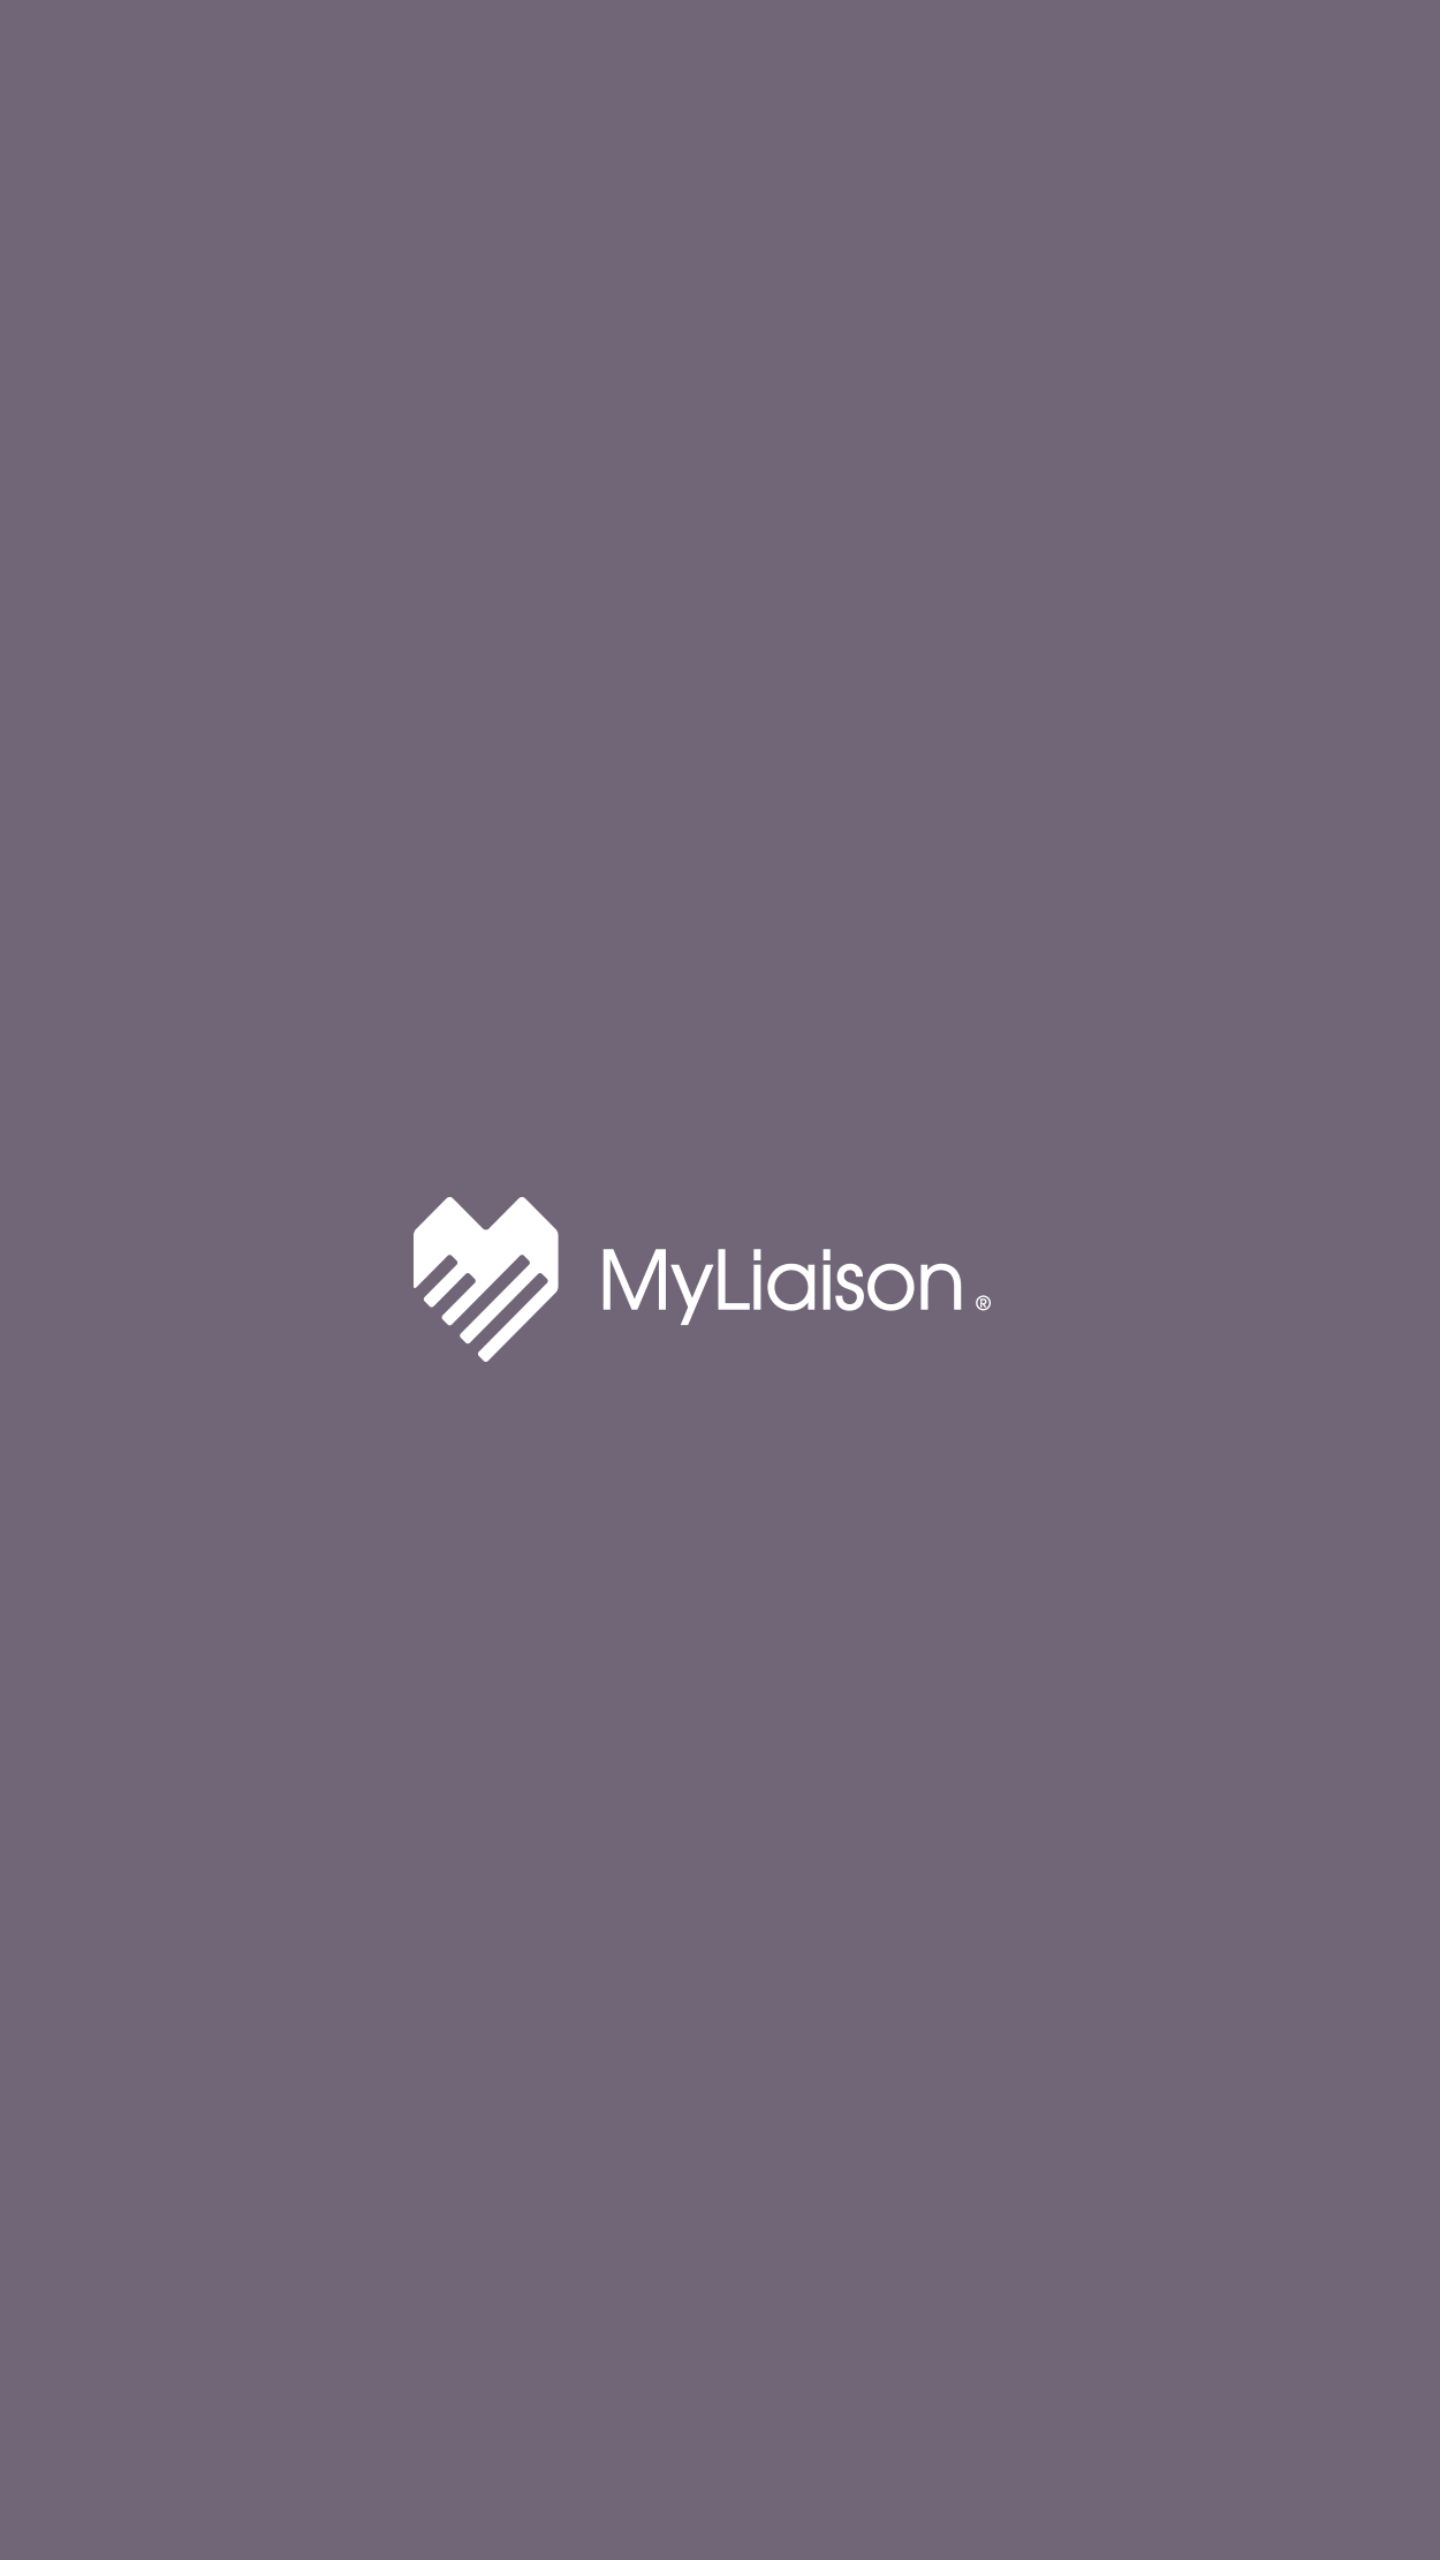 MyLiaison Showreel